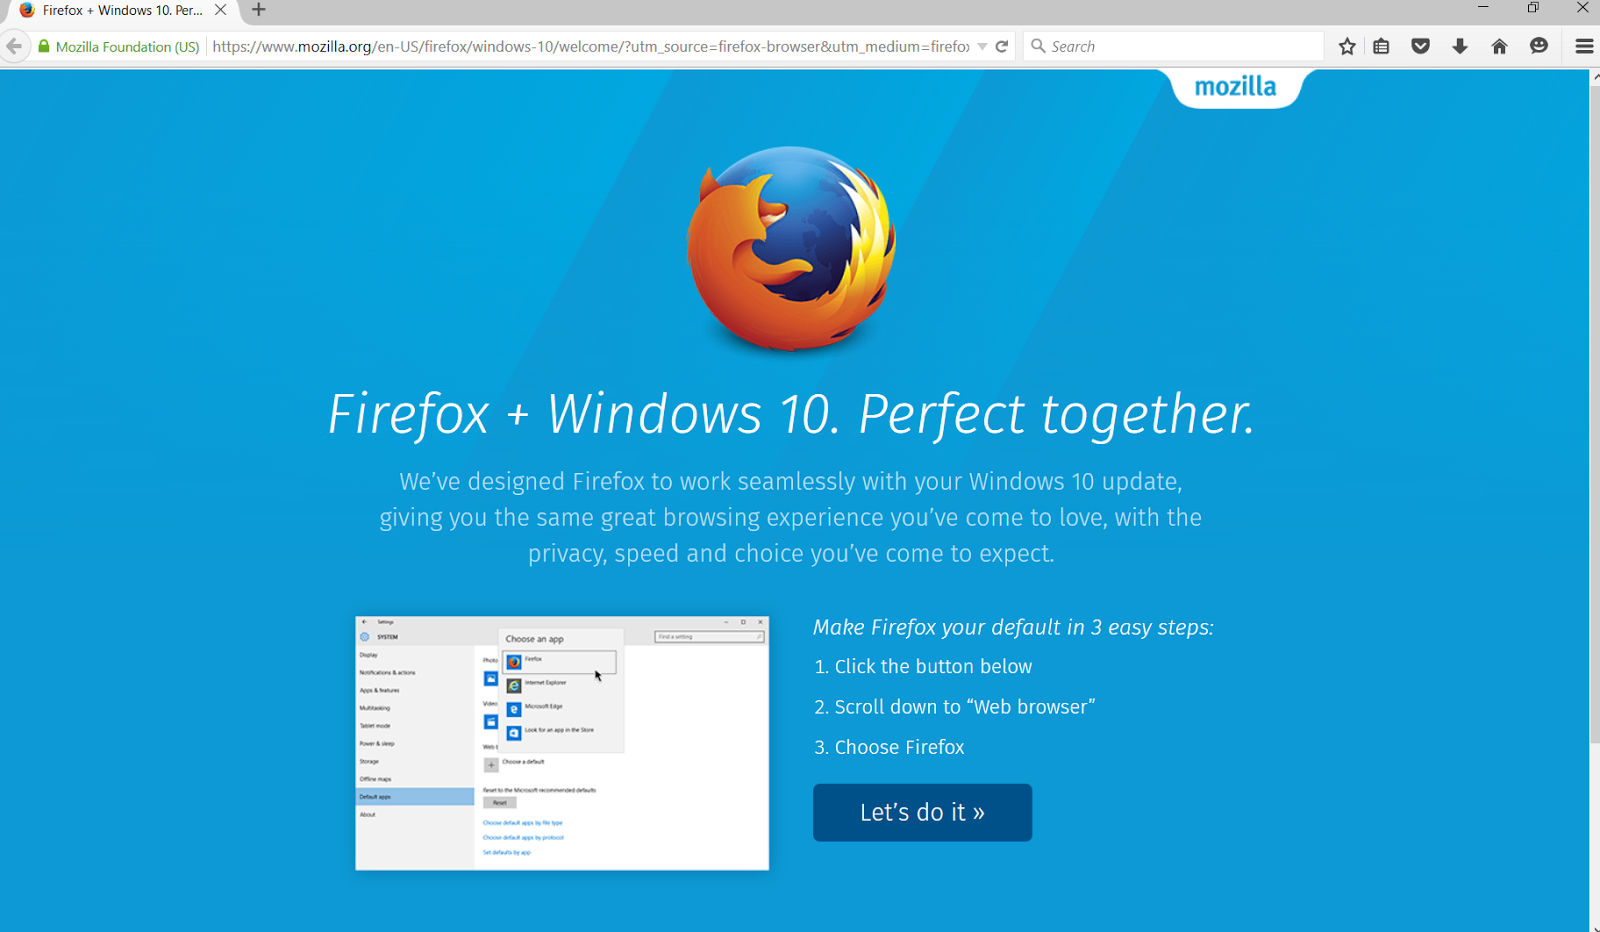 Selenium + Firefox on Windows 10 - get rid of the Windows 10 intro